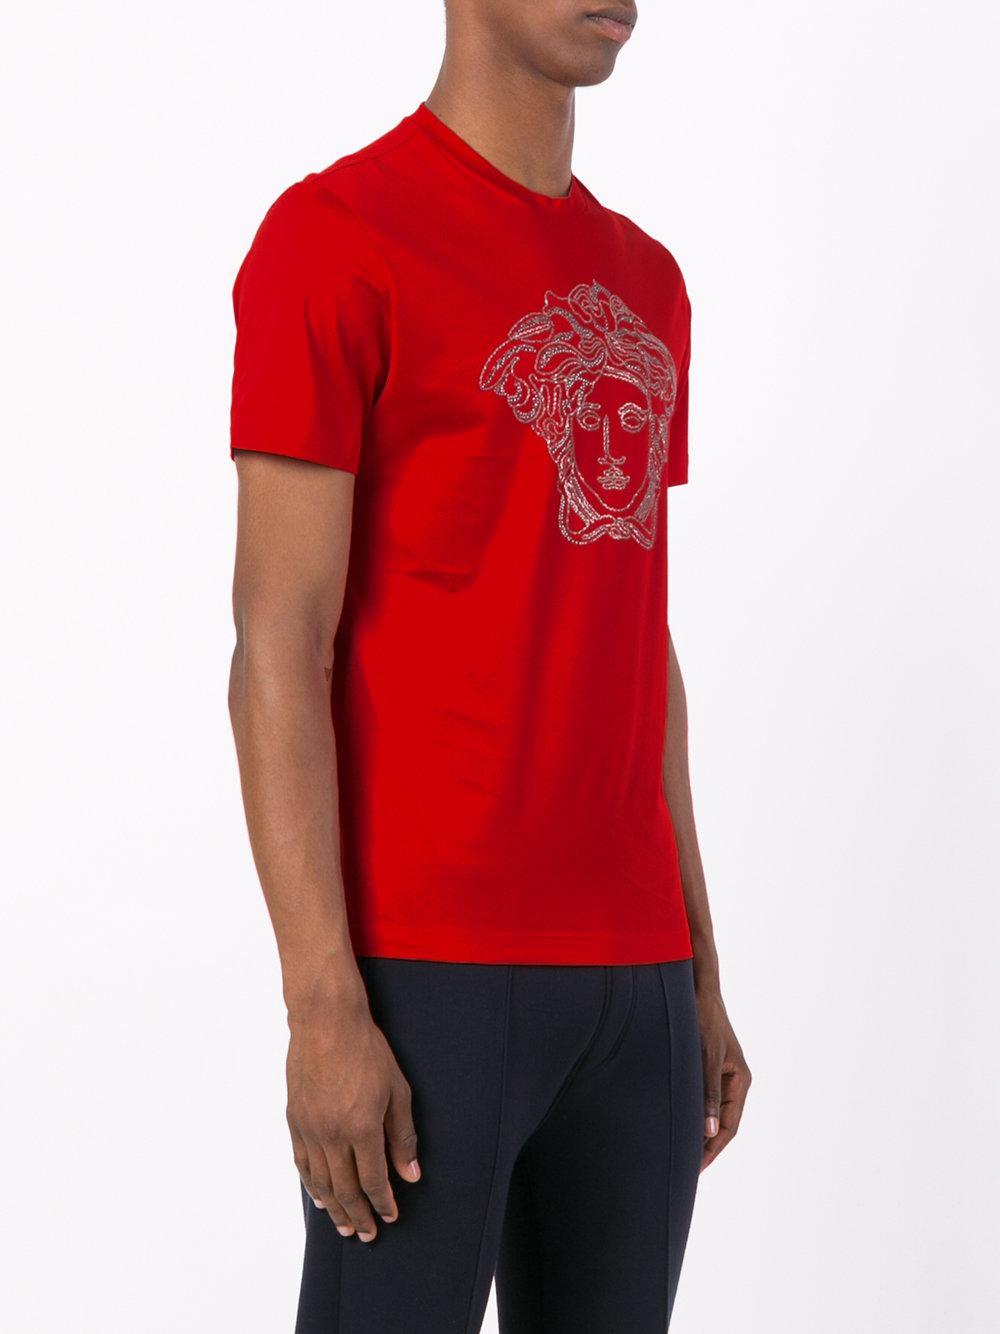 dfc3d166 Versace Medusa Head Swarovski T-shirt in Red for Men - Lyst